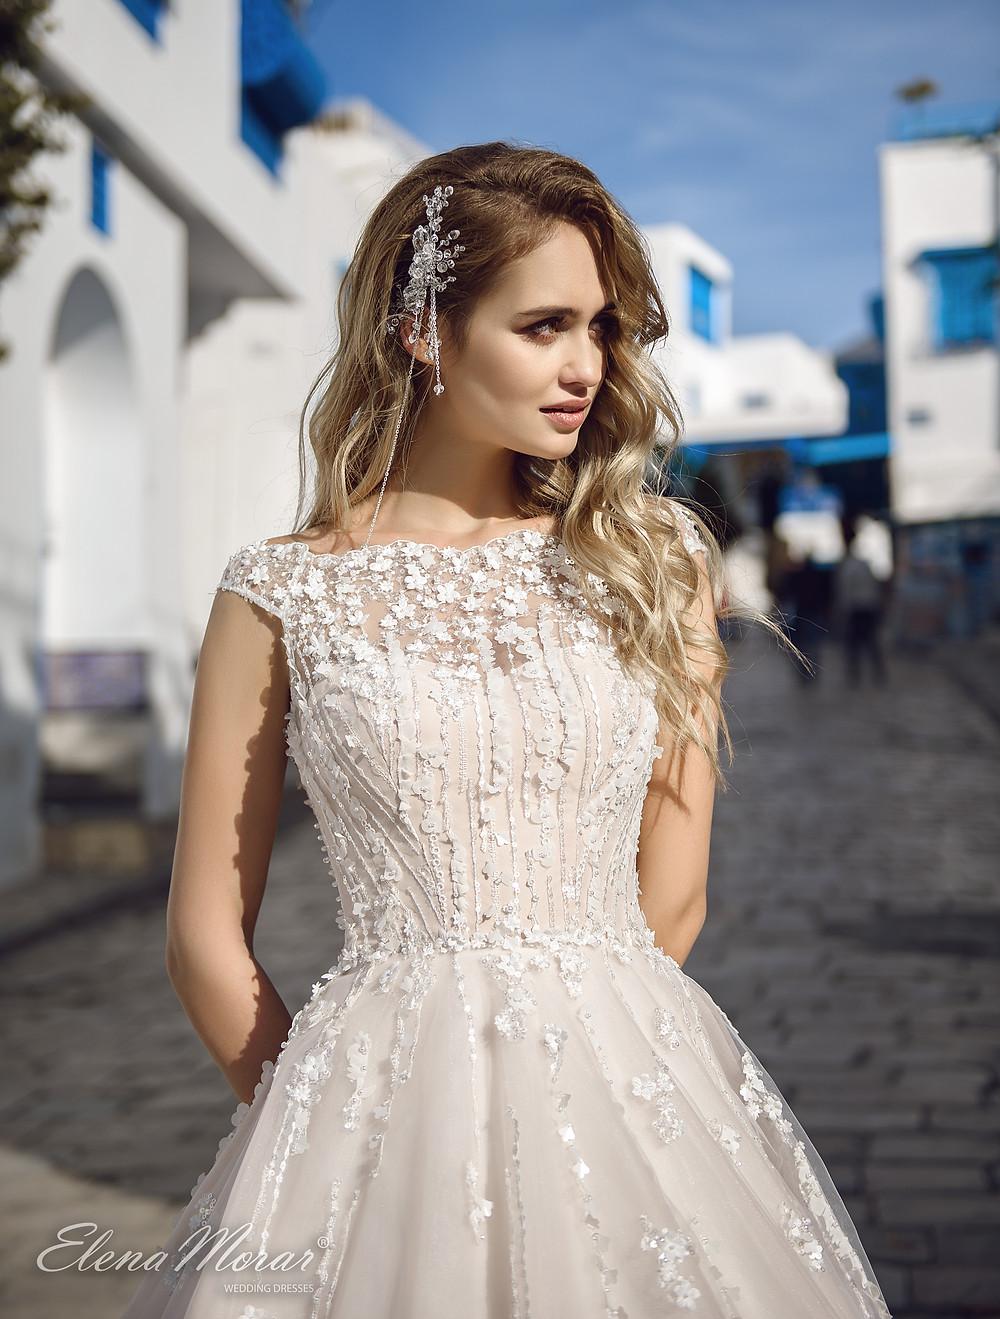 Elena Morar LF-019